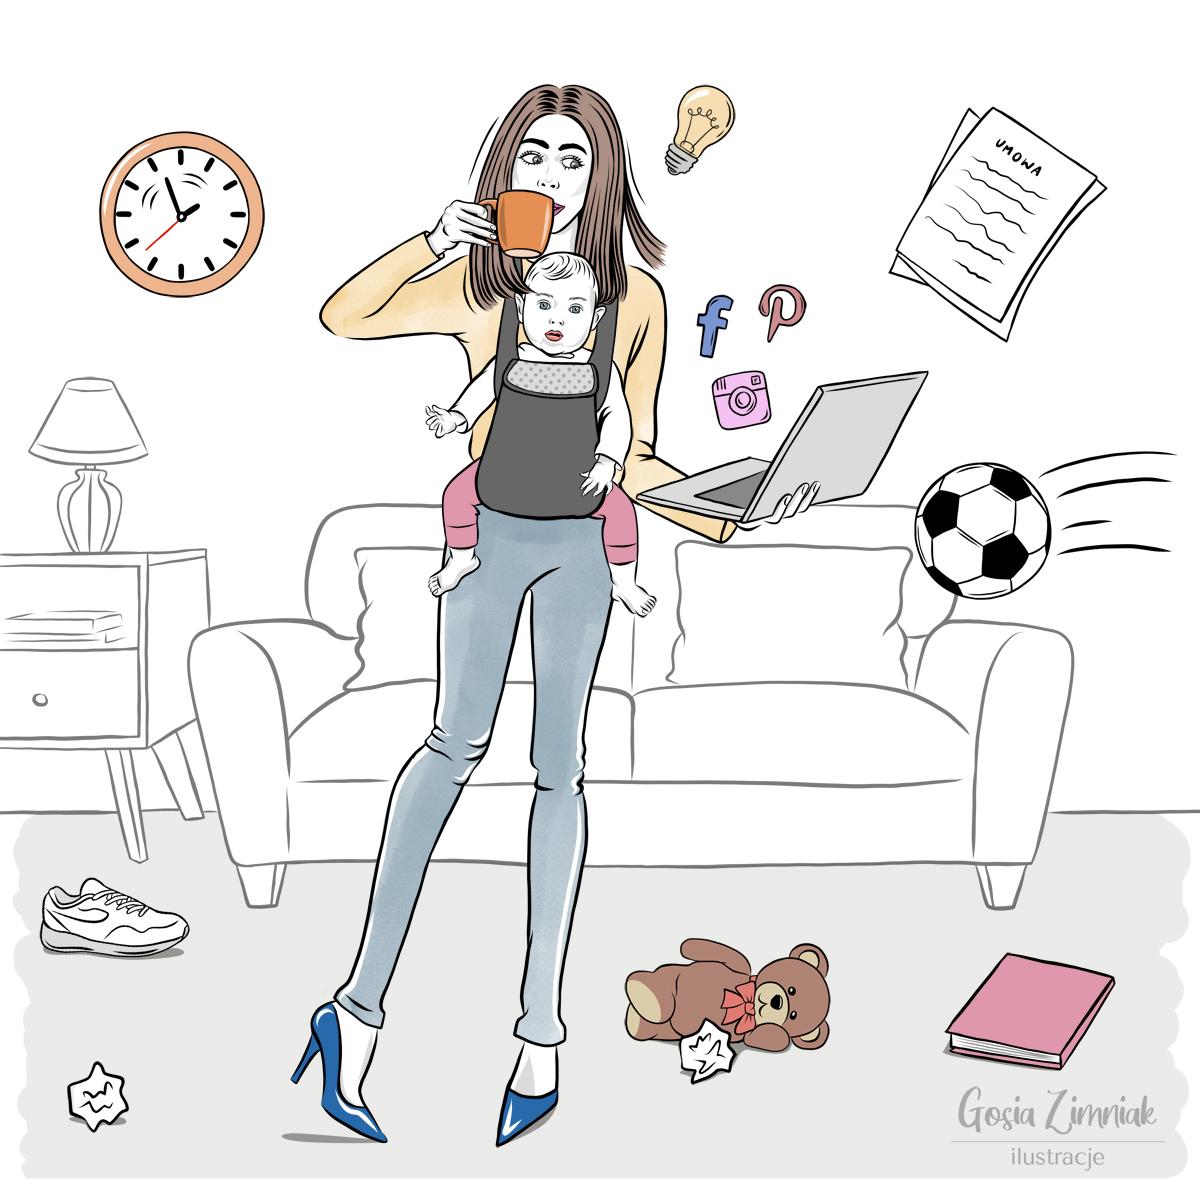 ilustracje lifestylowe